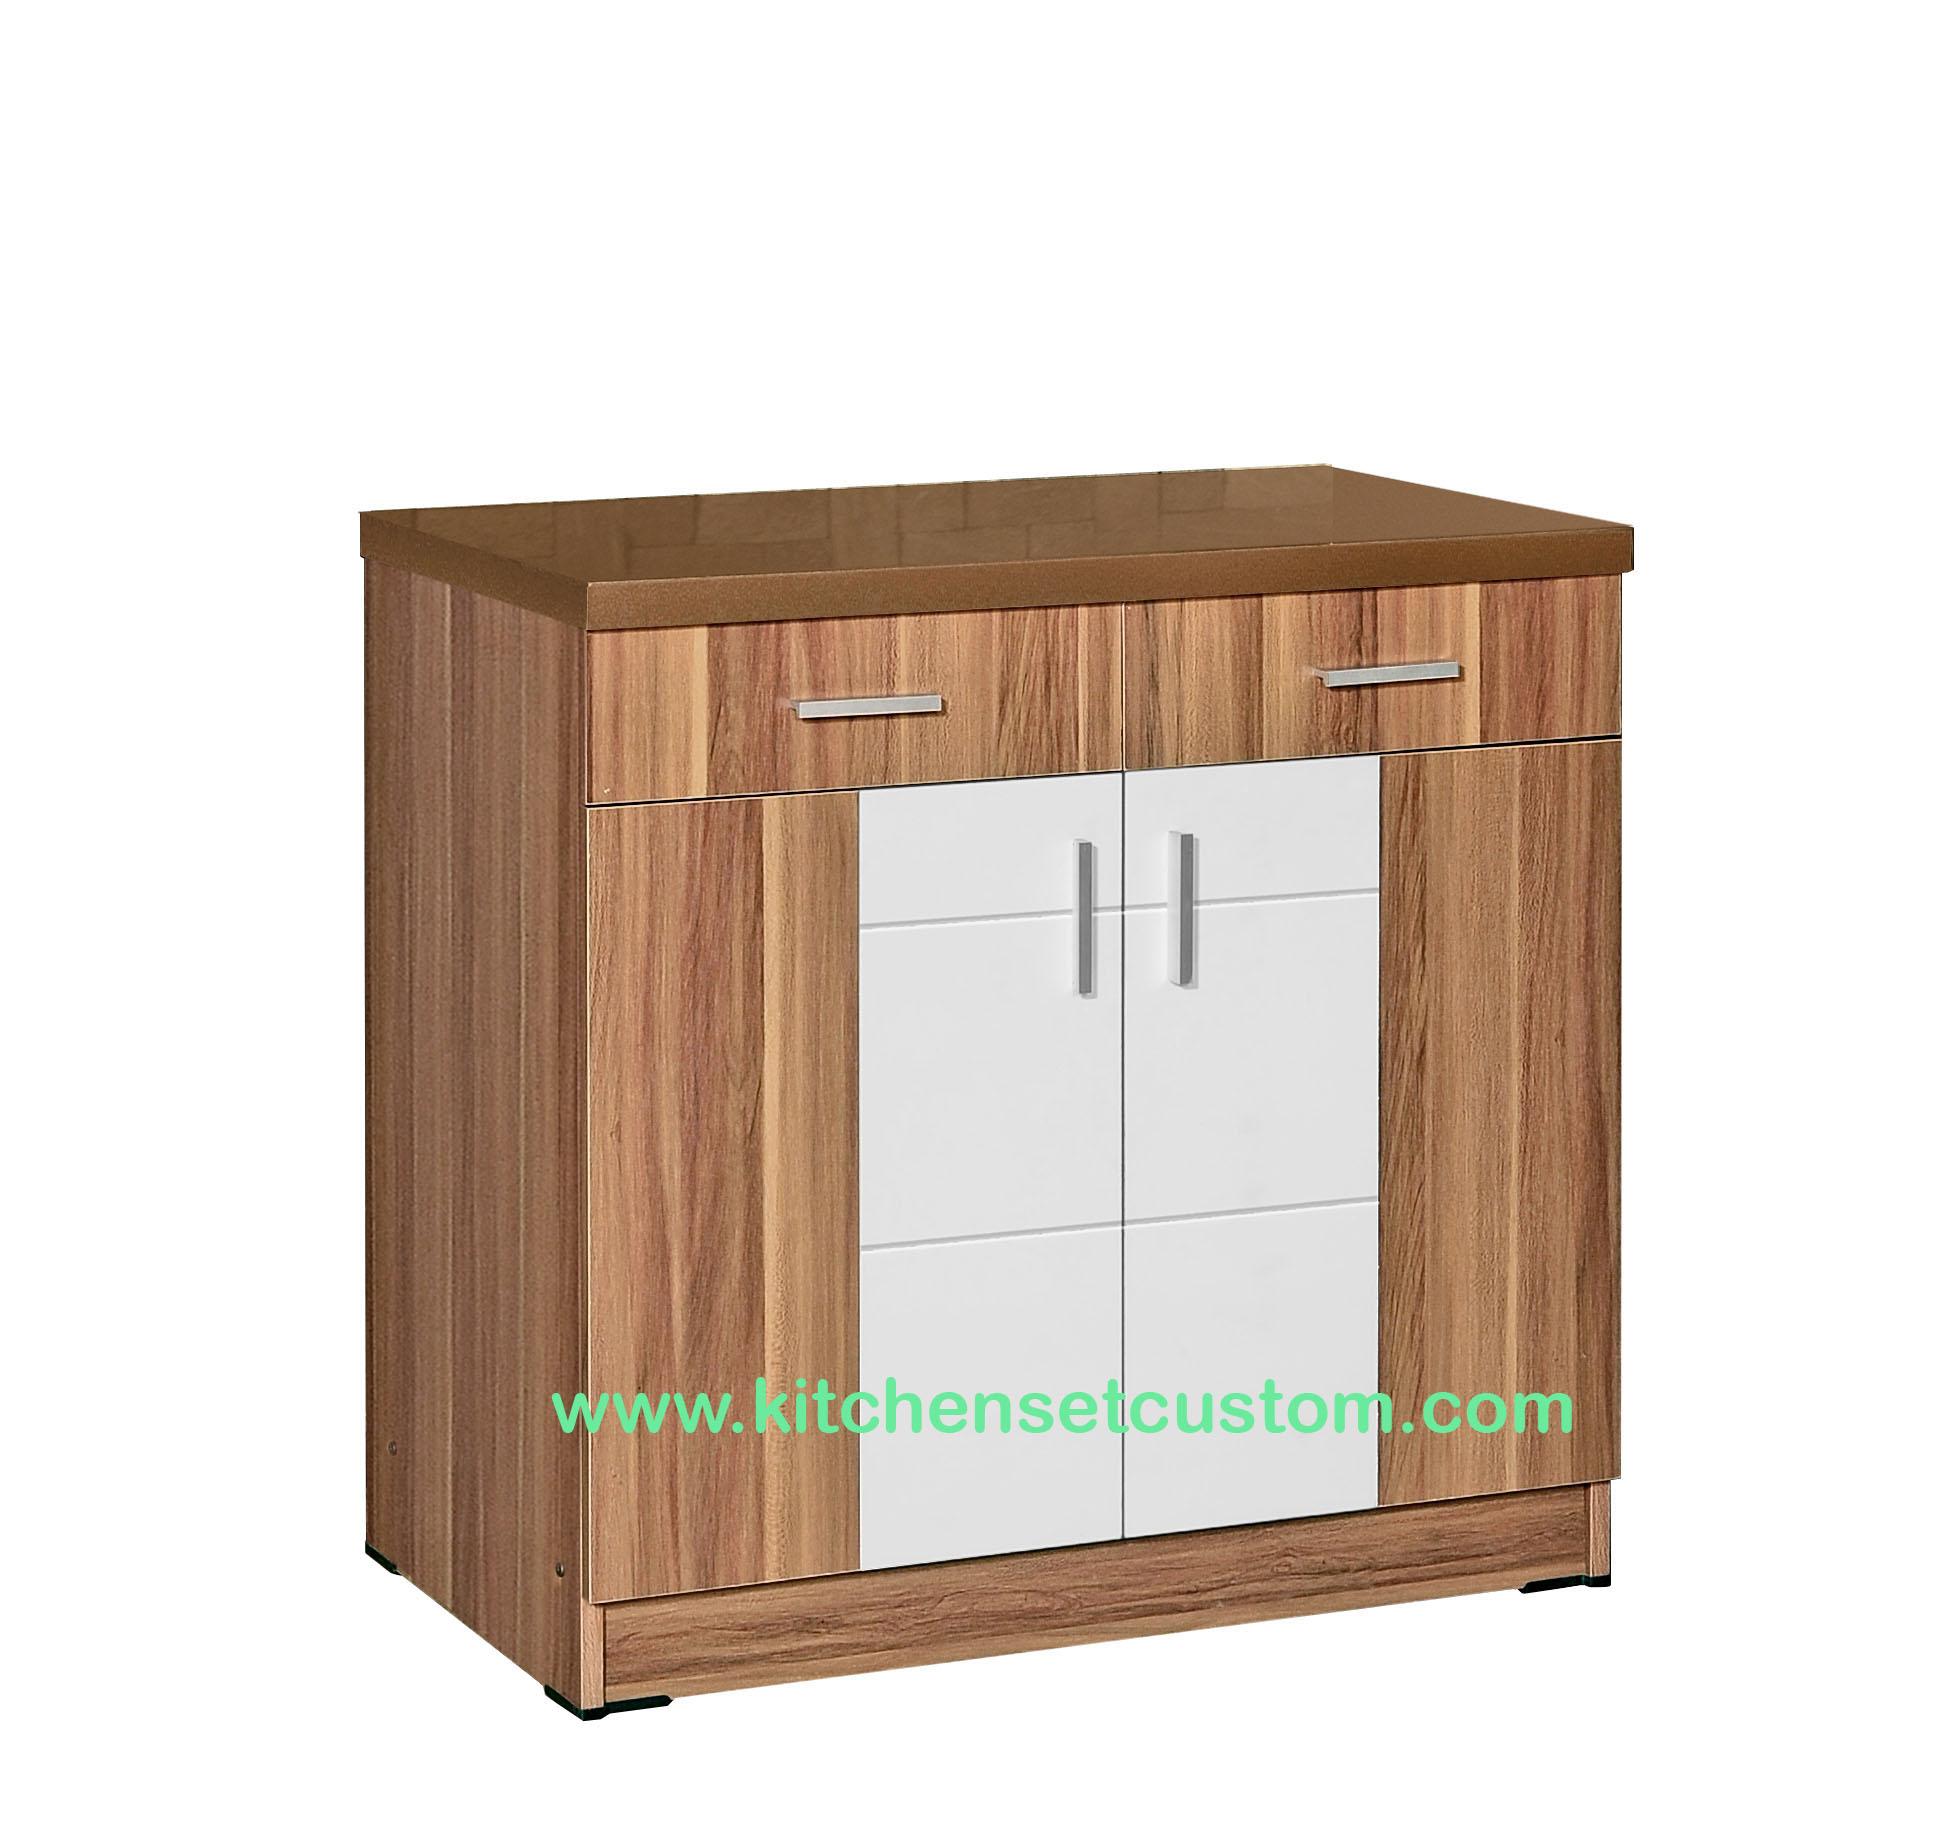 Kitchen Set 2 Pintu KSB 2752 Graver Furniture